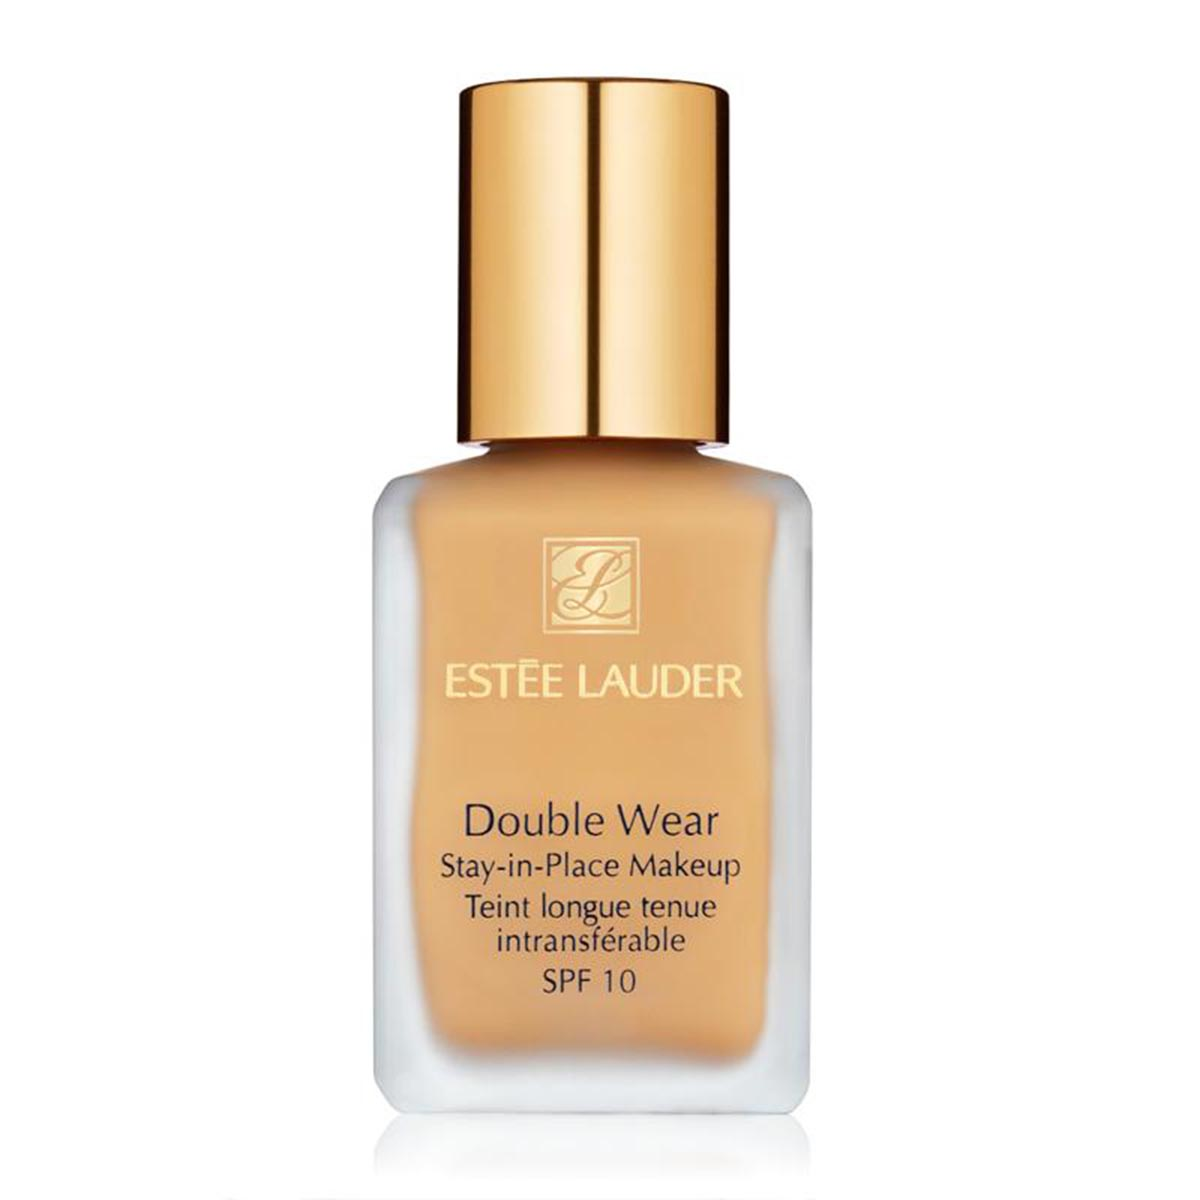 Estee lauder double wear foundation spf10 sand